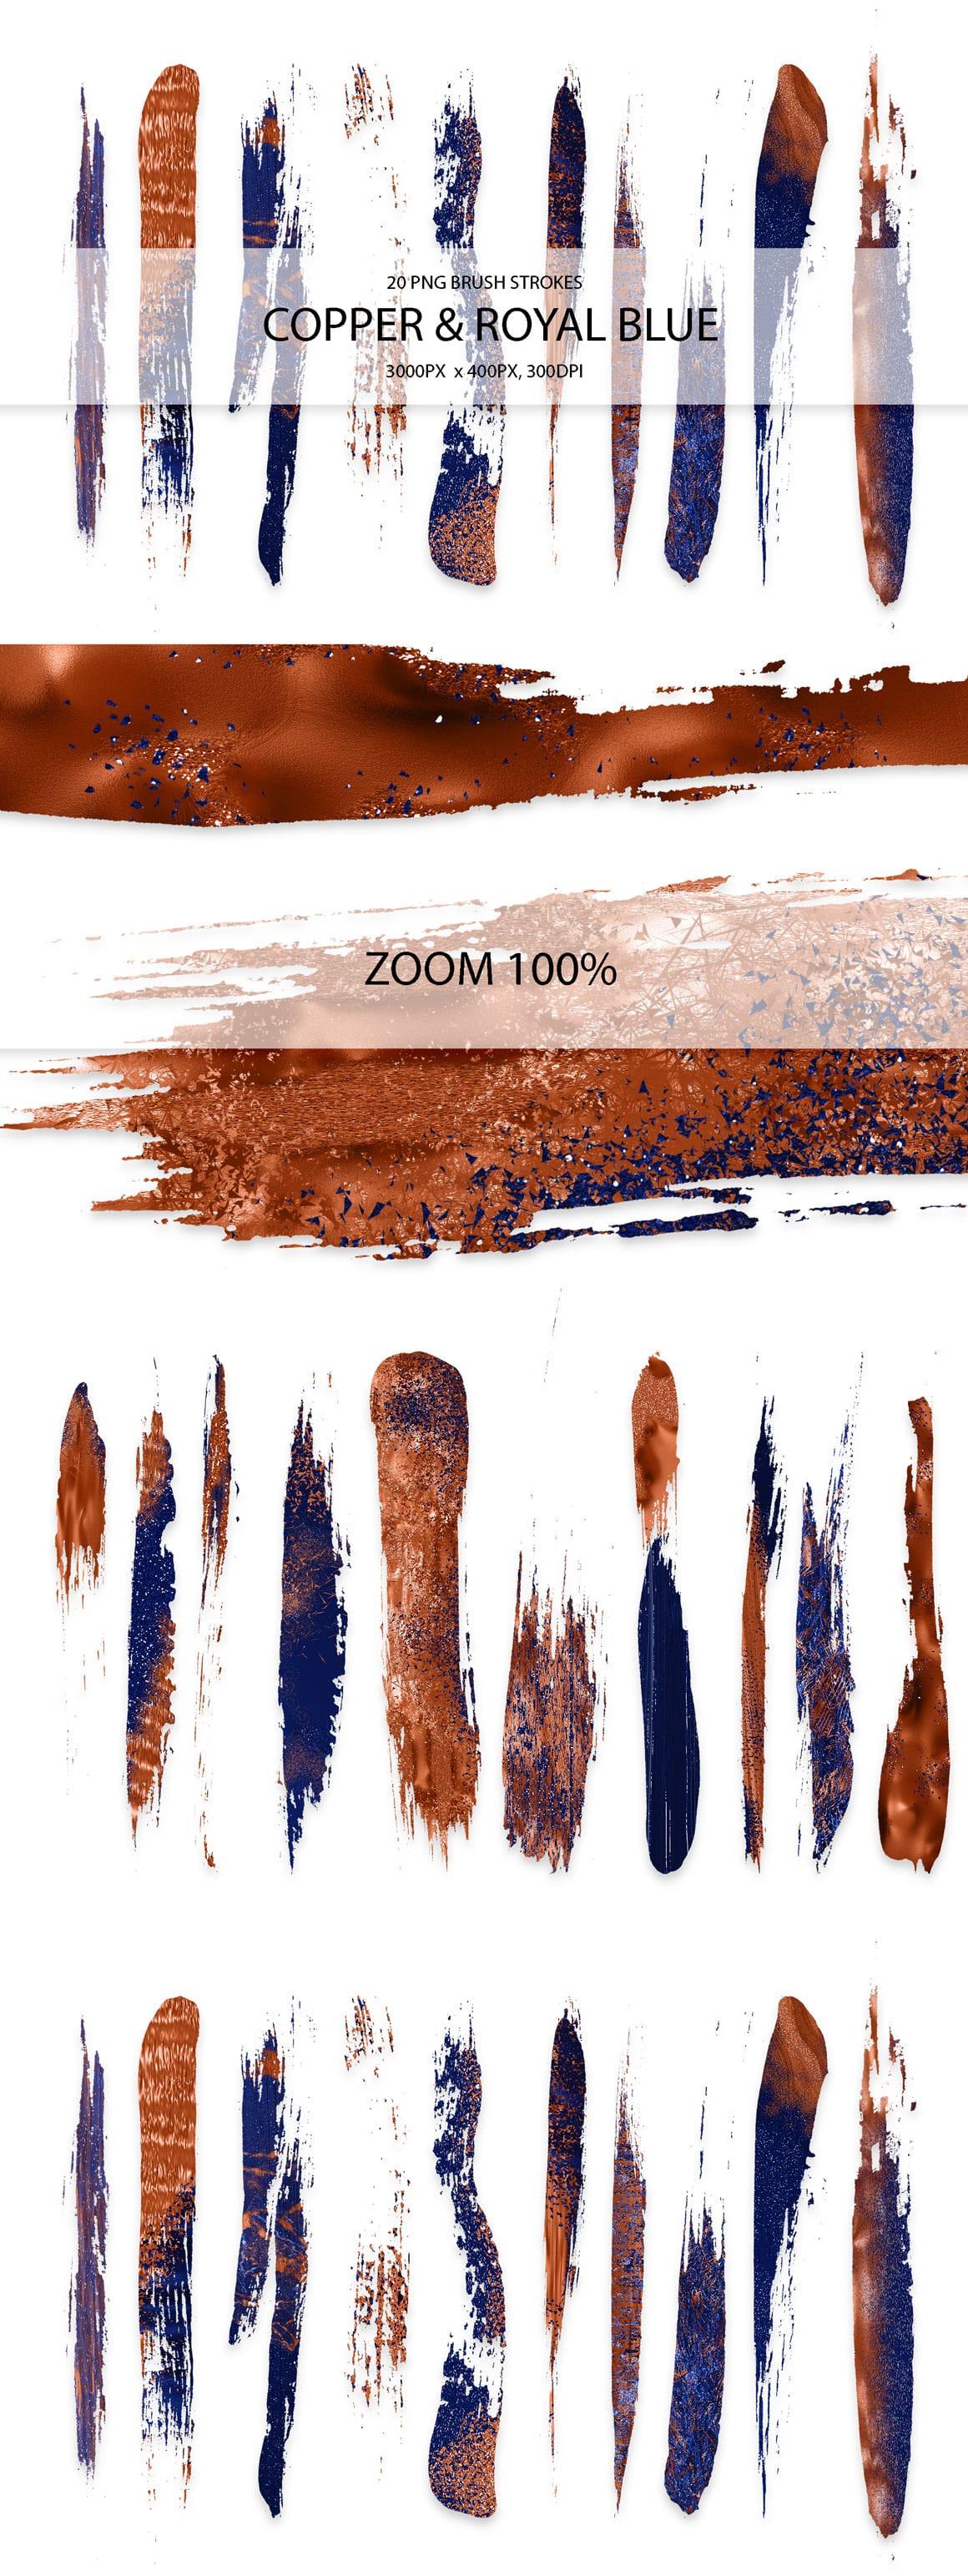 829 Acrylic Brush Strokes and Digital Brush Strokes - $9 - CopperRoyalBlueStrokes 01 min